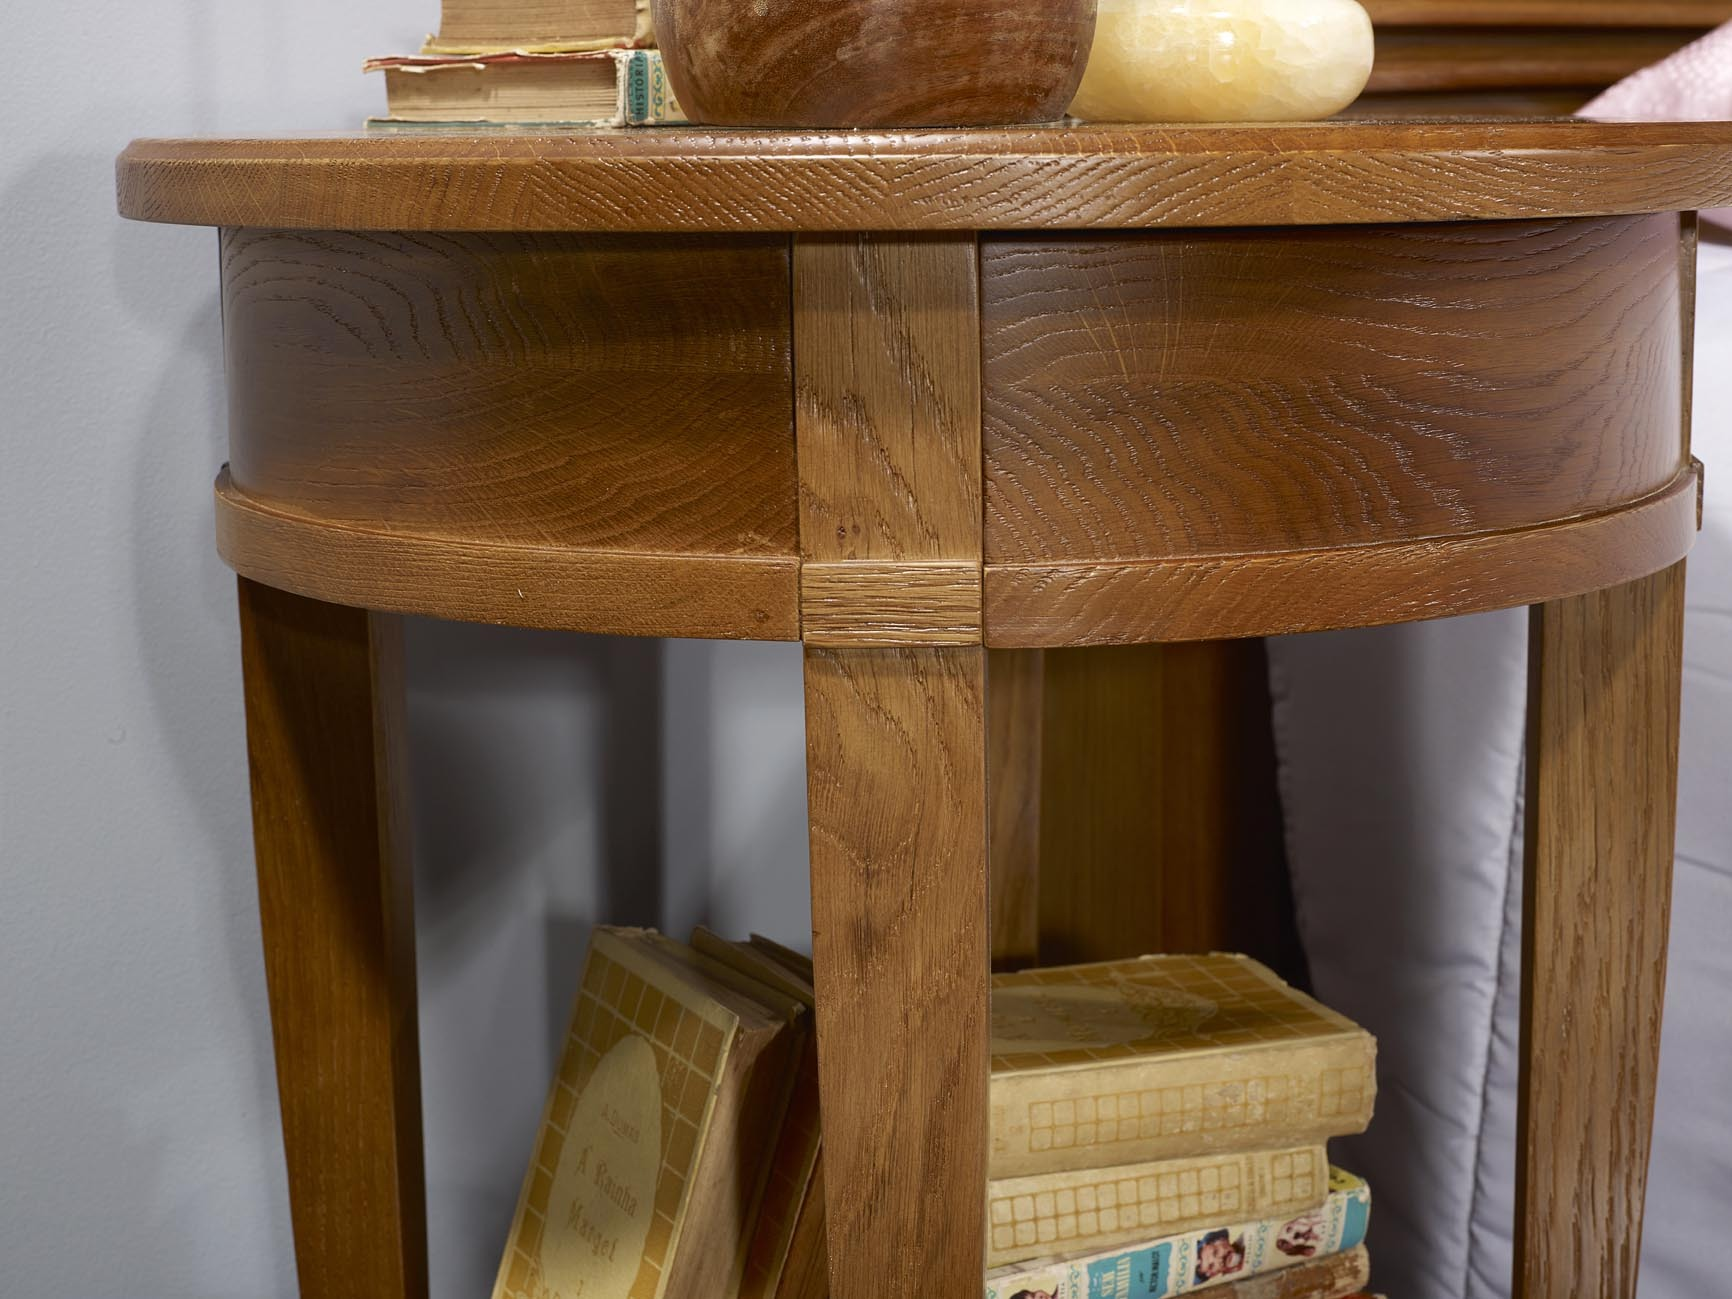 Mesa de noche/pedestal Luis estilo Diretoire hecha en madera maciza ...